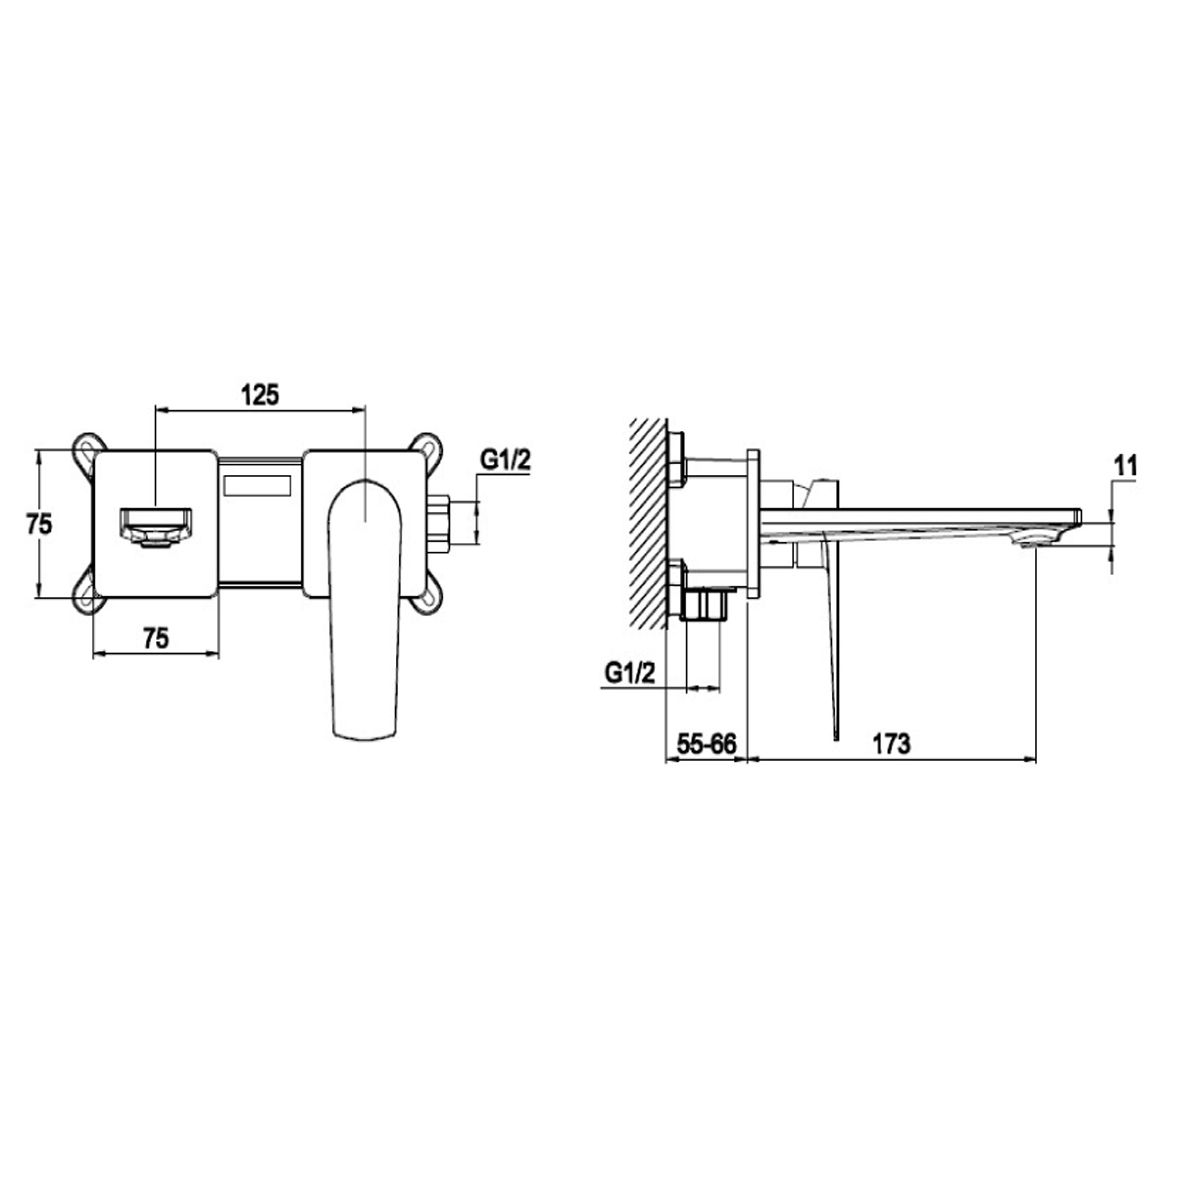 RAK Blade Wall Mounted Basin Mixer Tap Measurements